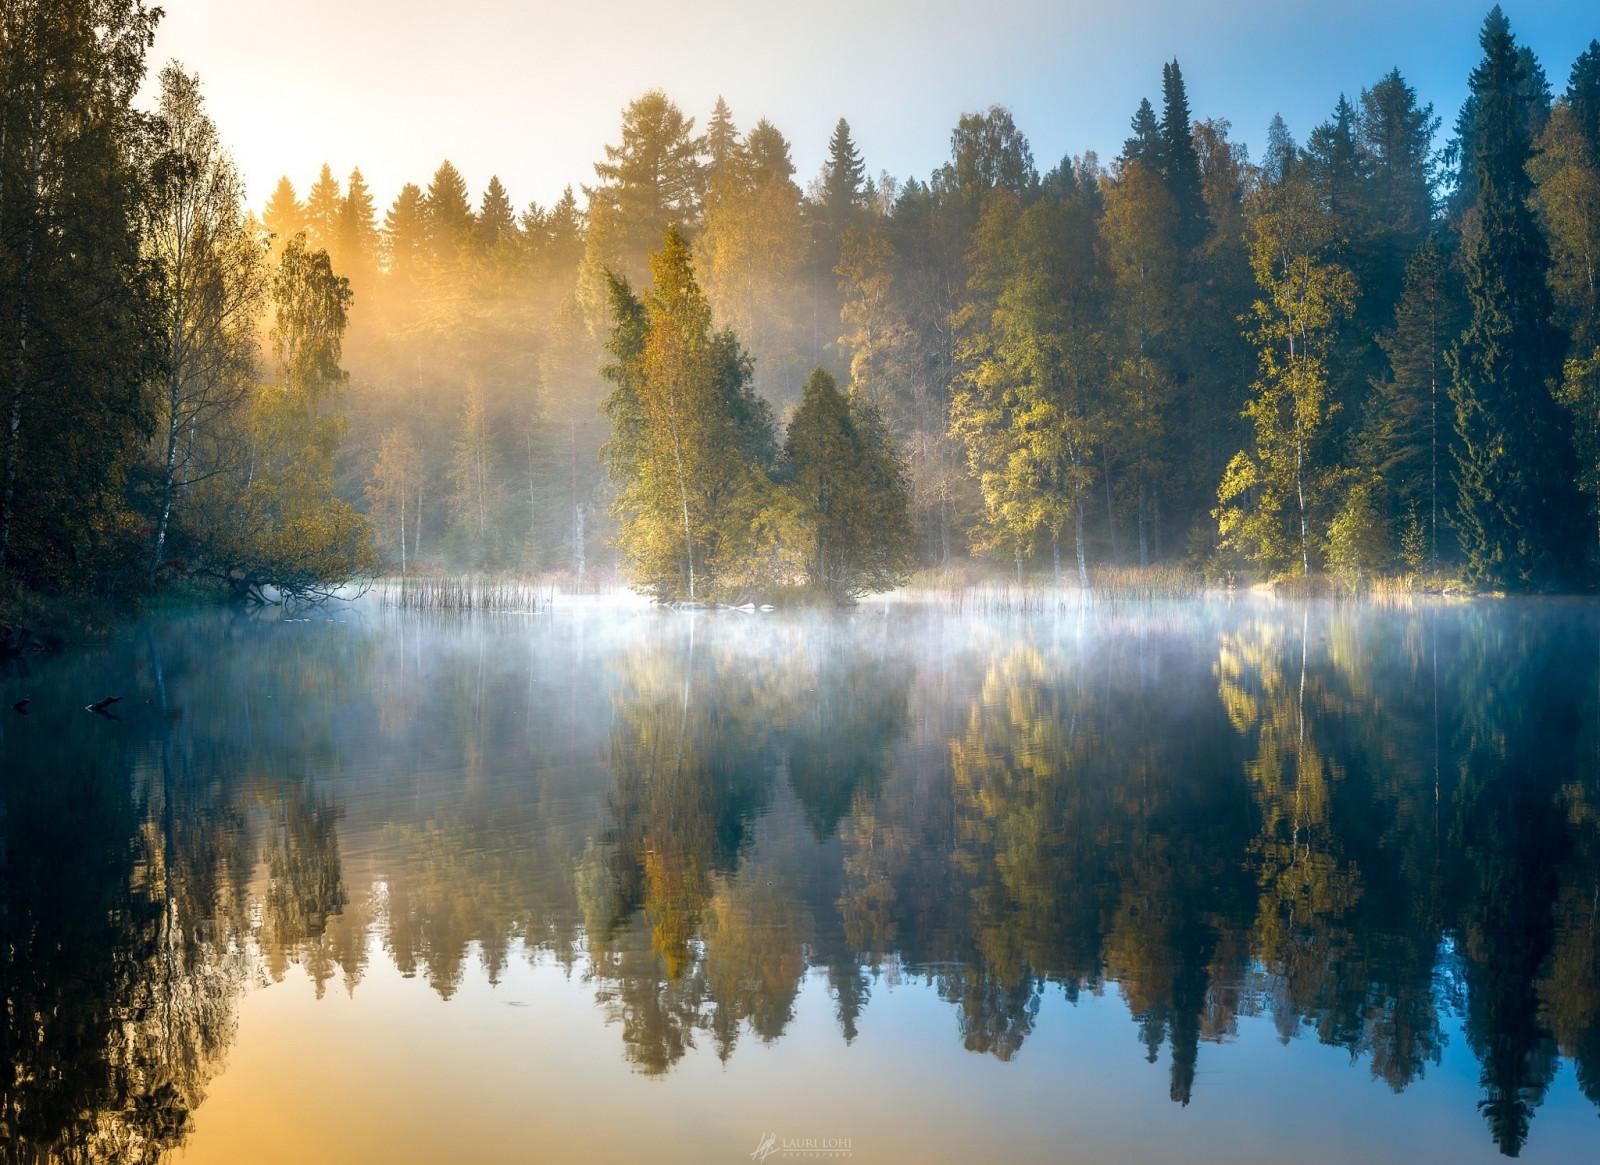 озеро туман обои на рабочий стол № 381756 без смс